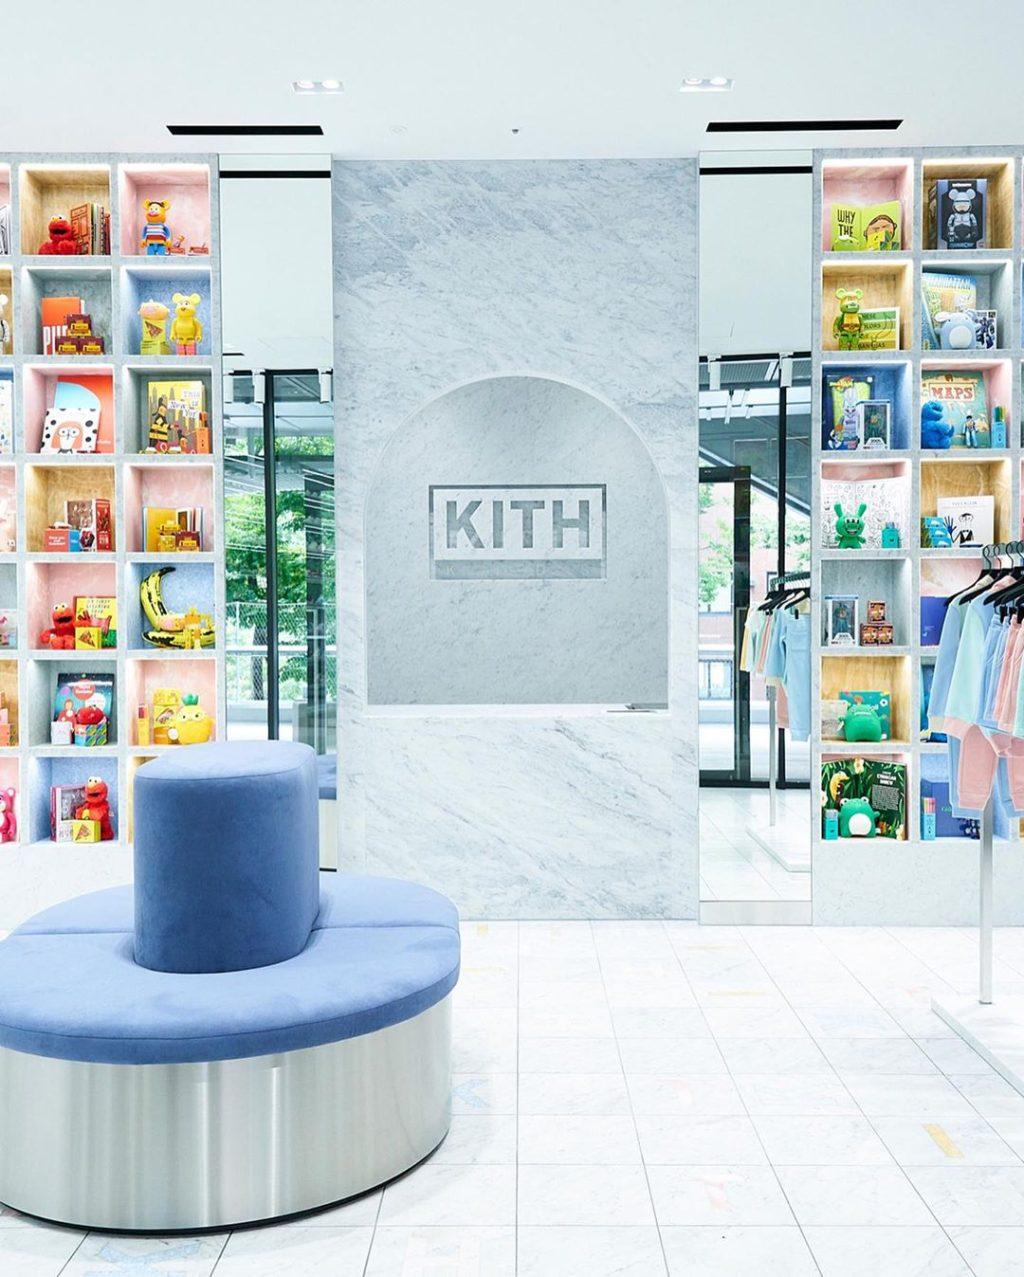 kith-tokyo-open-20200704